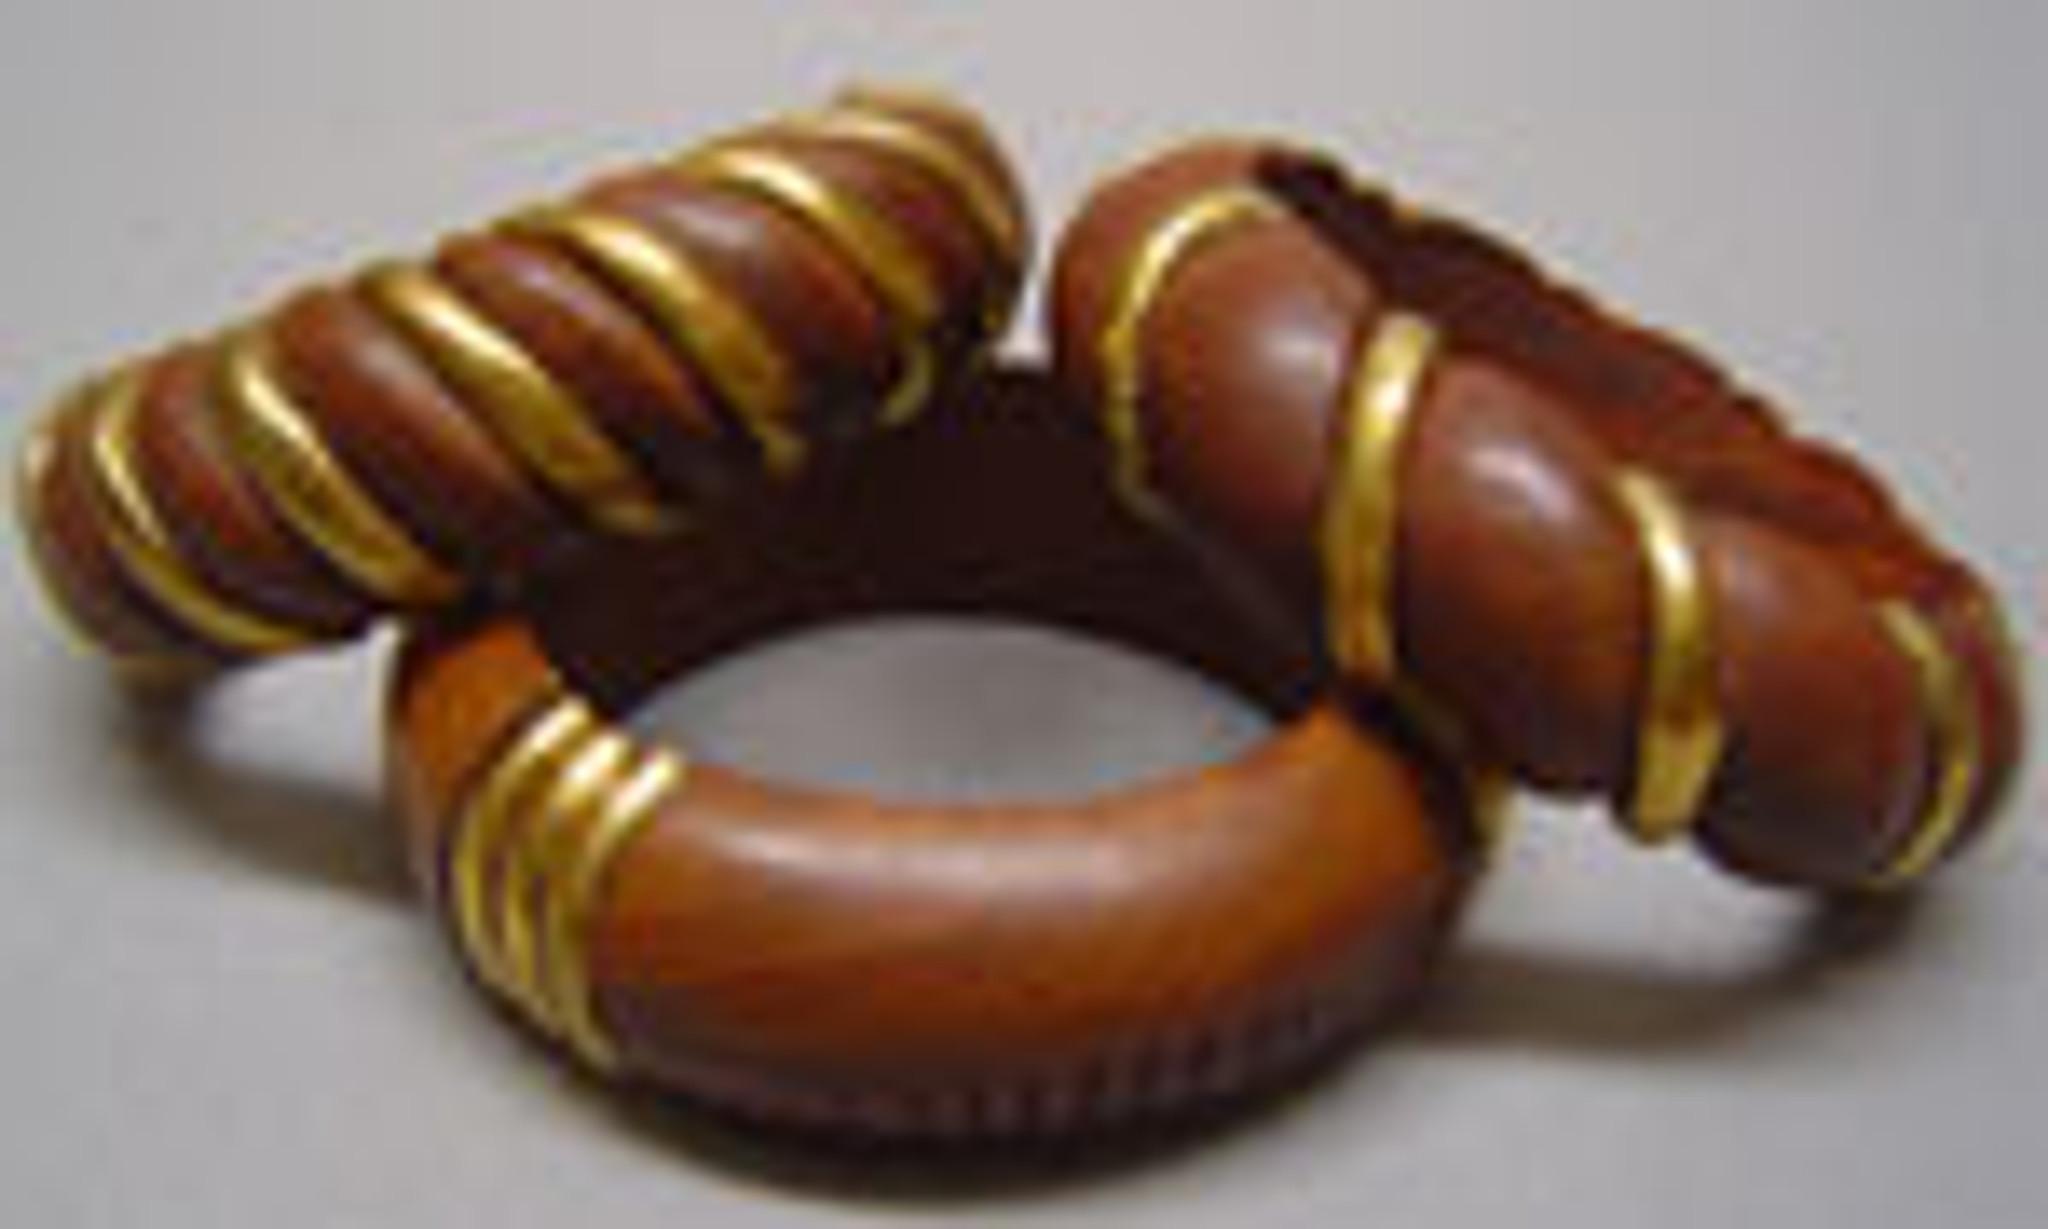 Oni Classic Wood Bangles with Gold Embellishment - 3pc Set